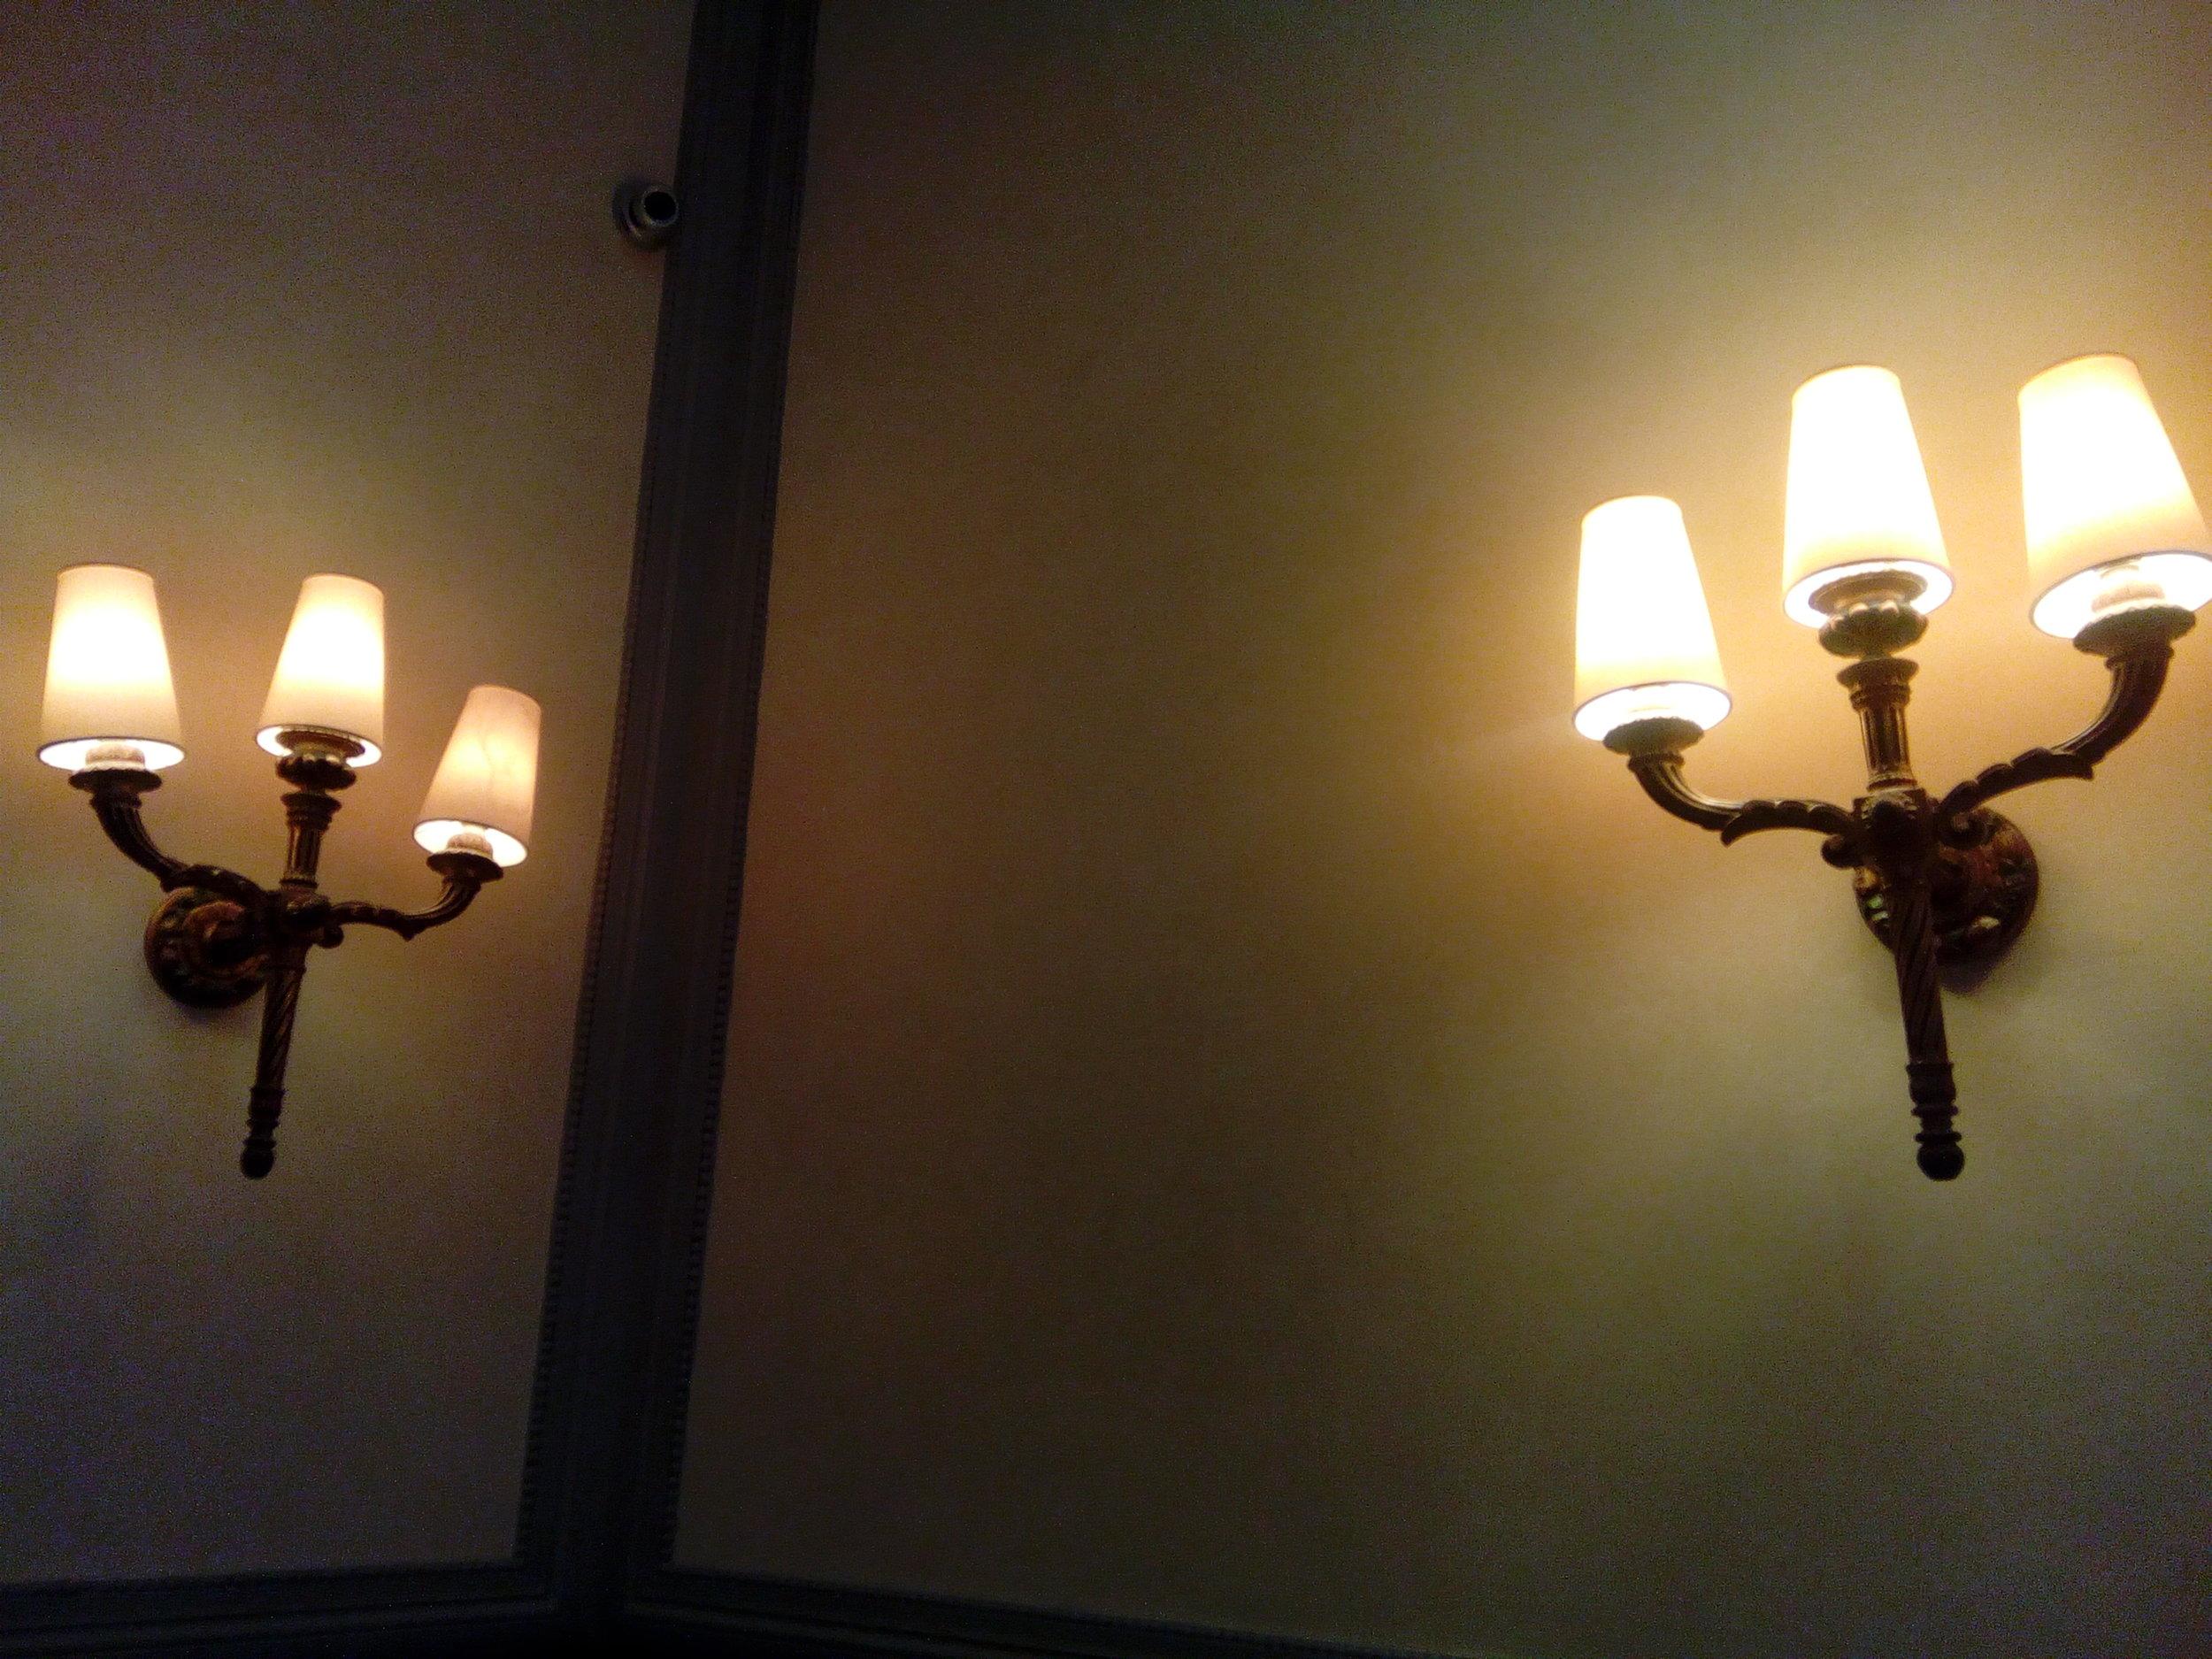 hk 14 light tridents.jpg